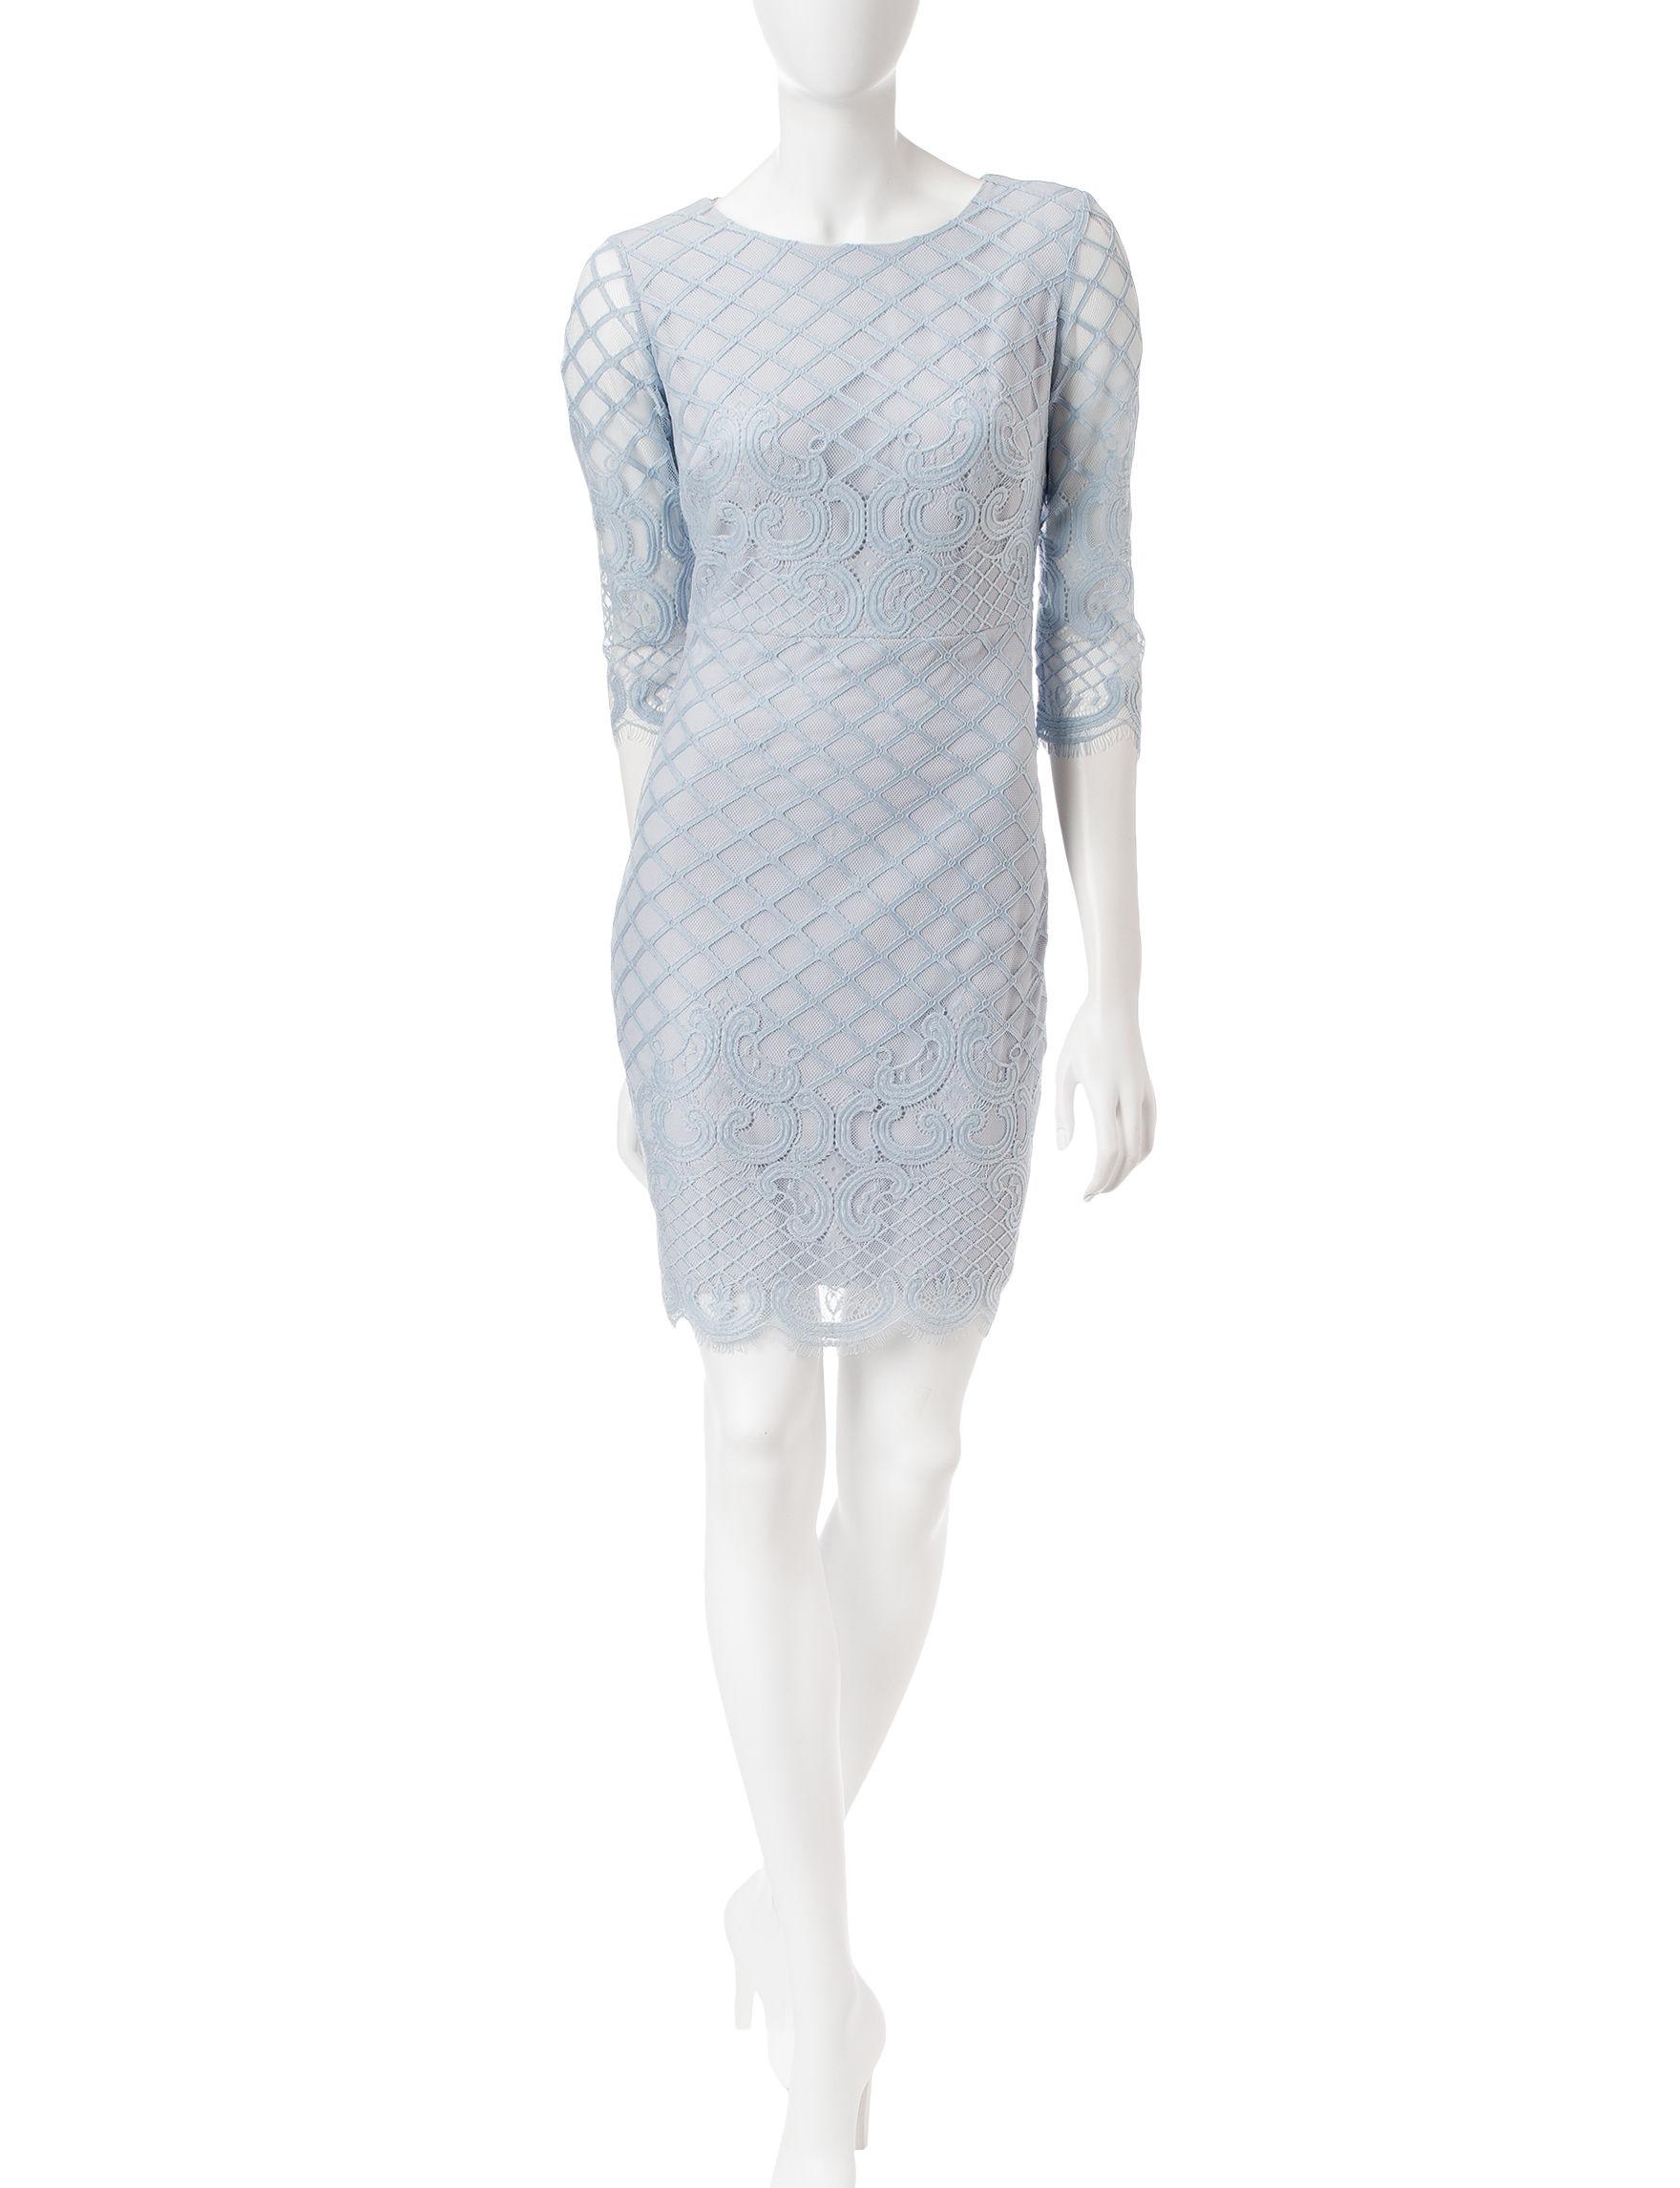 Sangria Blue Cocktail & Party Evening & Formal Sheath Dresses